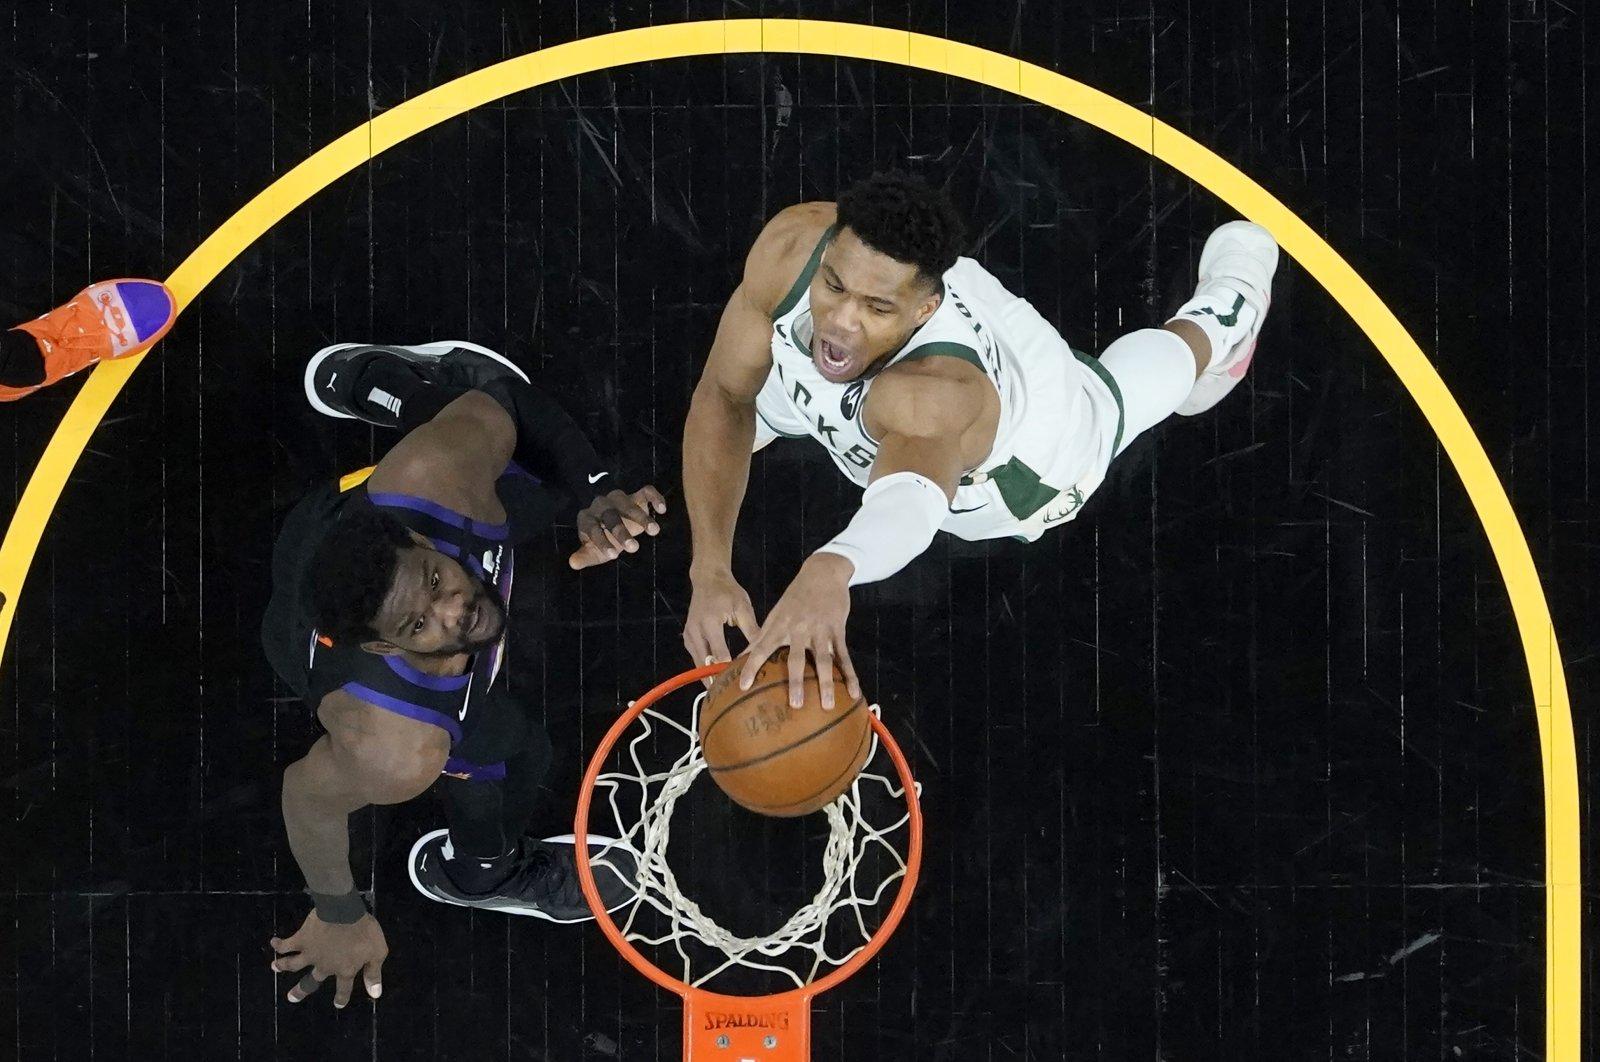 Milwaukee Bucks forward Giannis Antetokounmpo (R) dunks over Phoenix Suns center Deandre Ayton during Game 2 of NBA Finals, July 8, 2021, Phoenix, Arizona, U.S. (AP Photo)